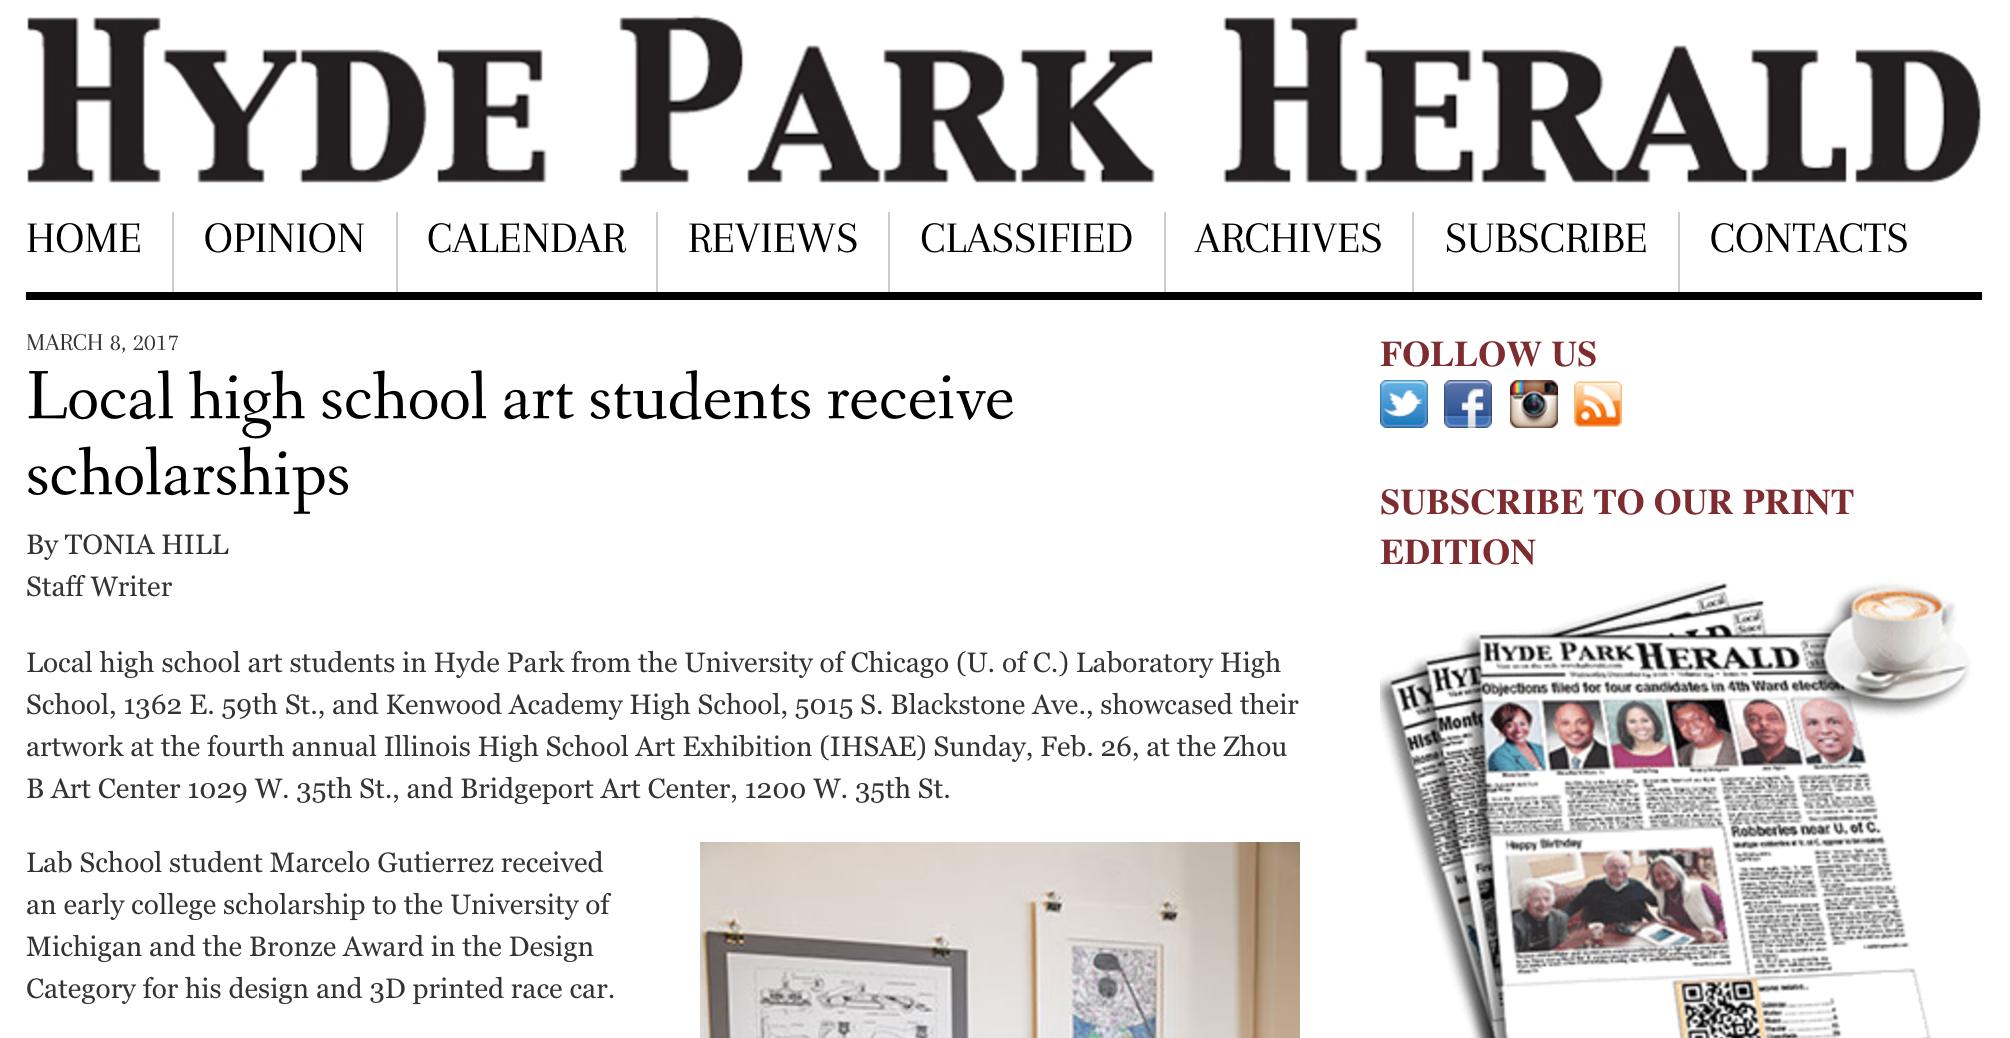 Exhibition Review via Hyde Park Herald